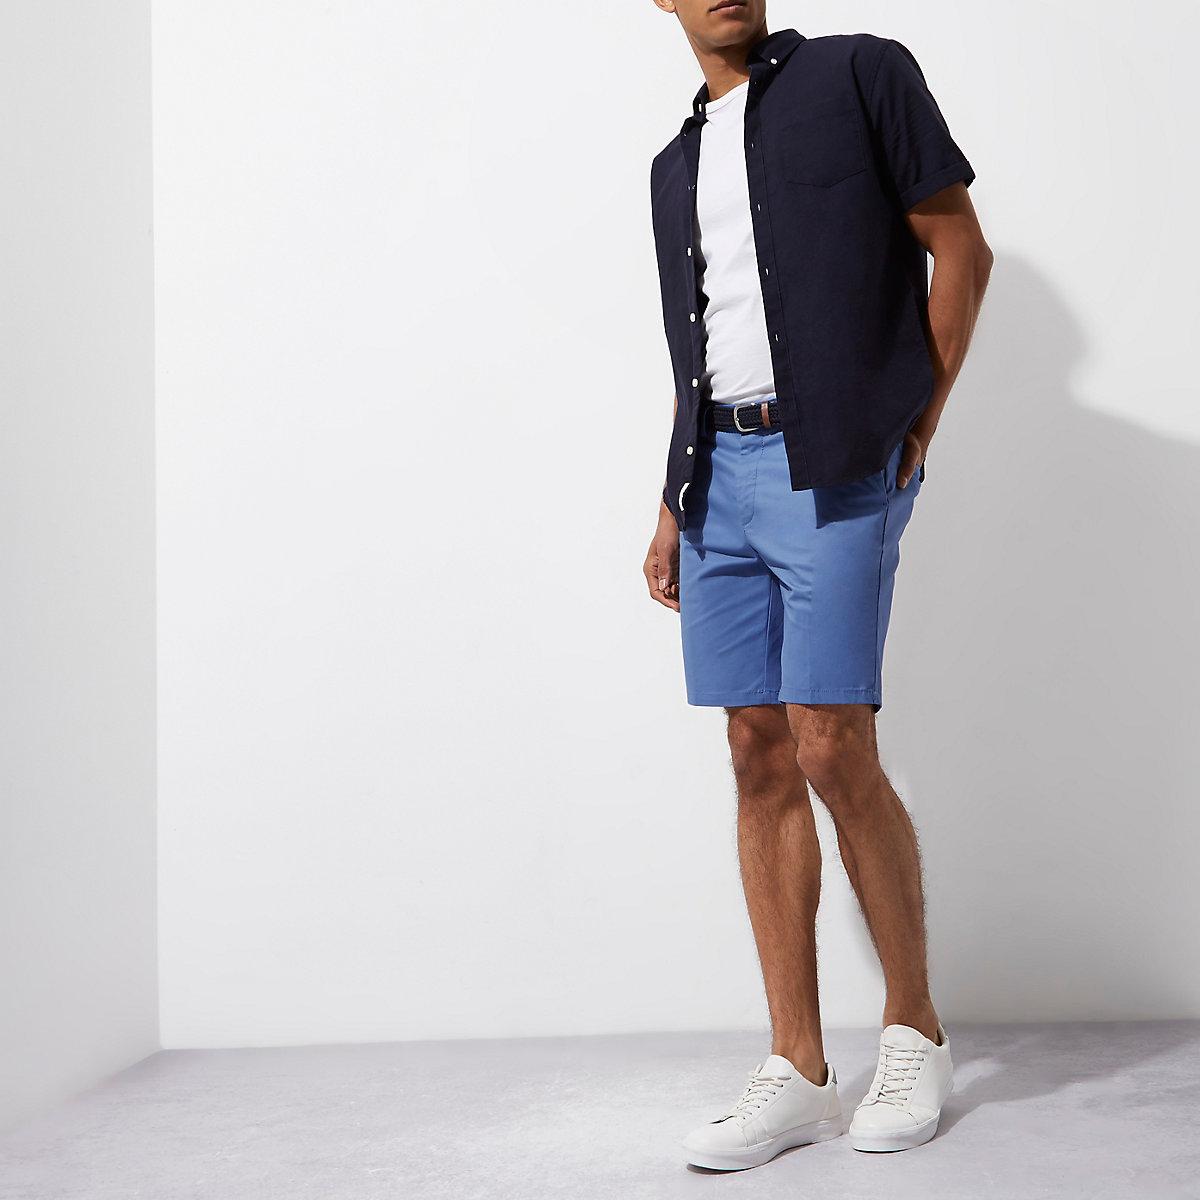 Blue belted shorts